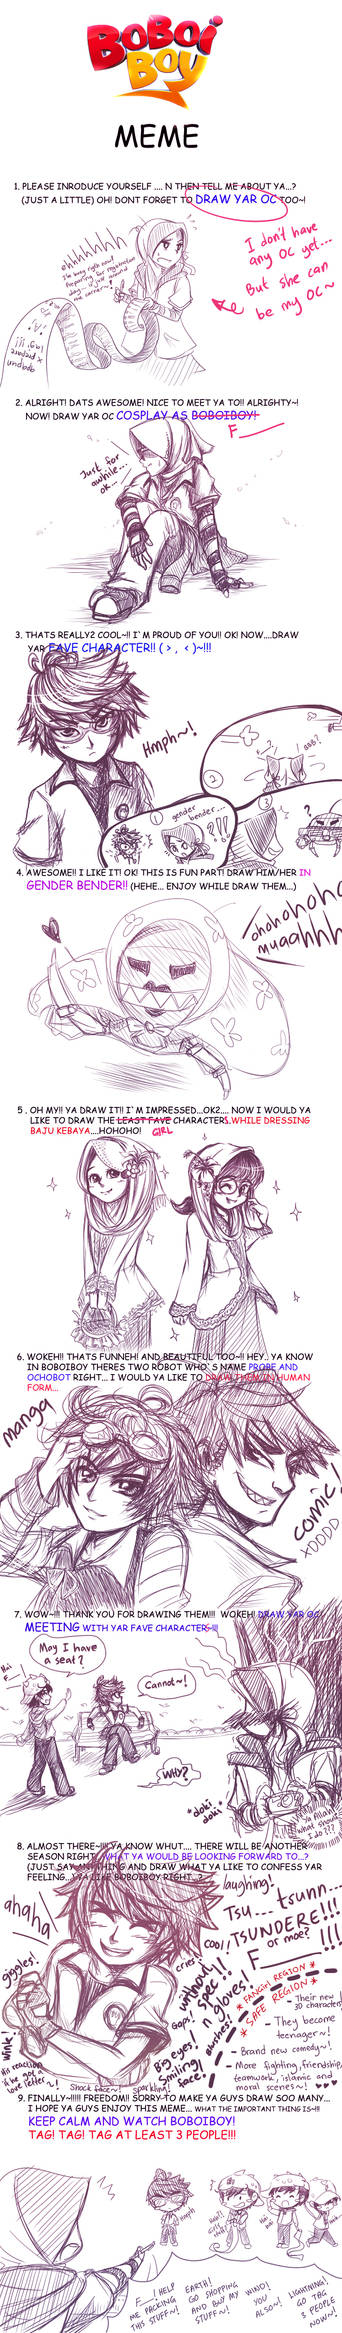 BoBoiBoy Meme 2~! by ryocutema